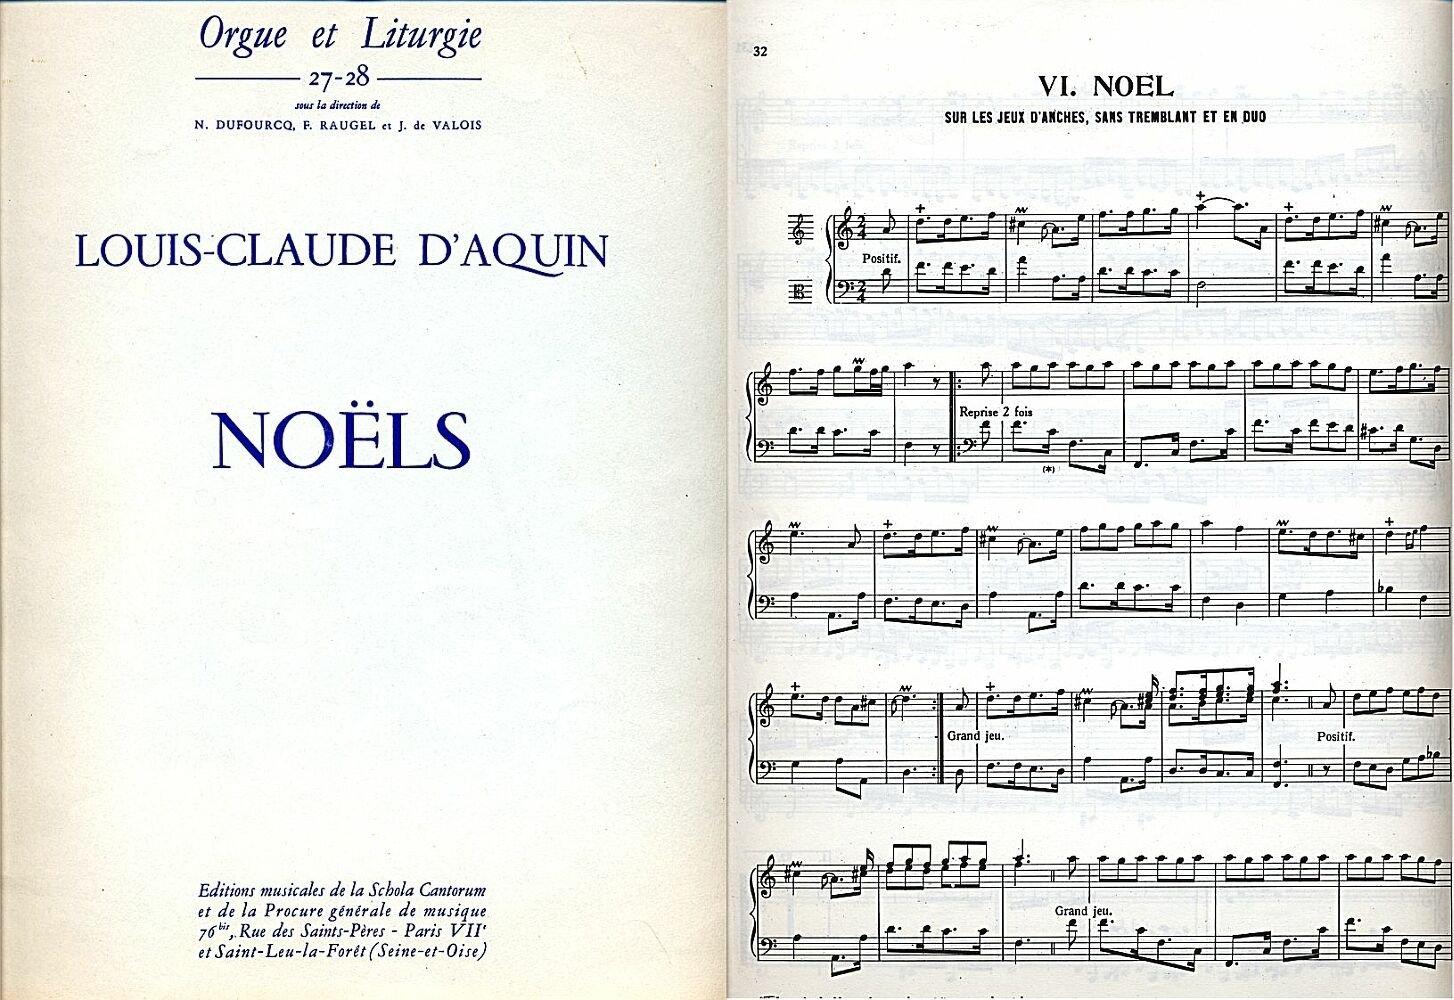 Composer Un Menu De Noel.New Book Of Noels For Organ Complete Nouveau Livre De